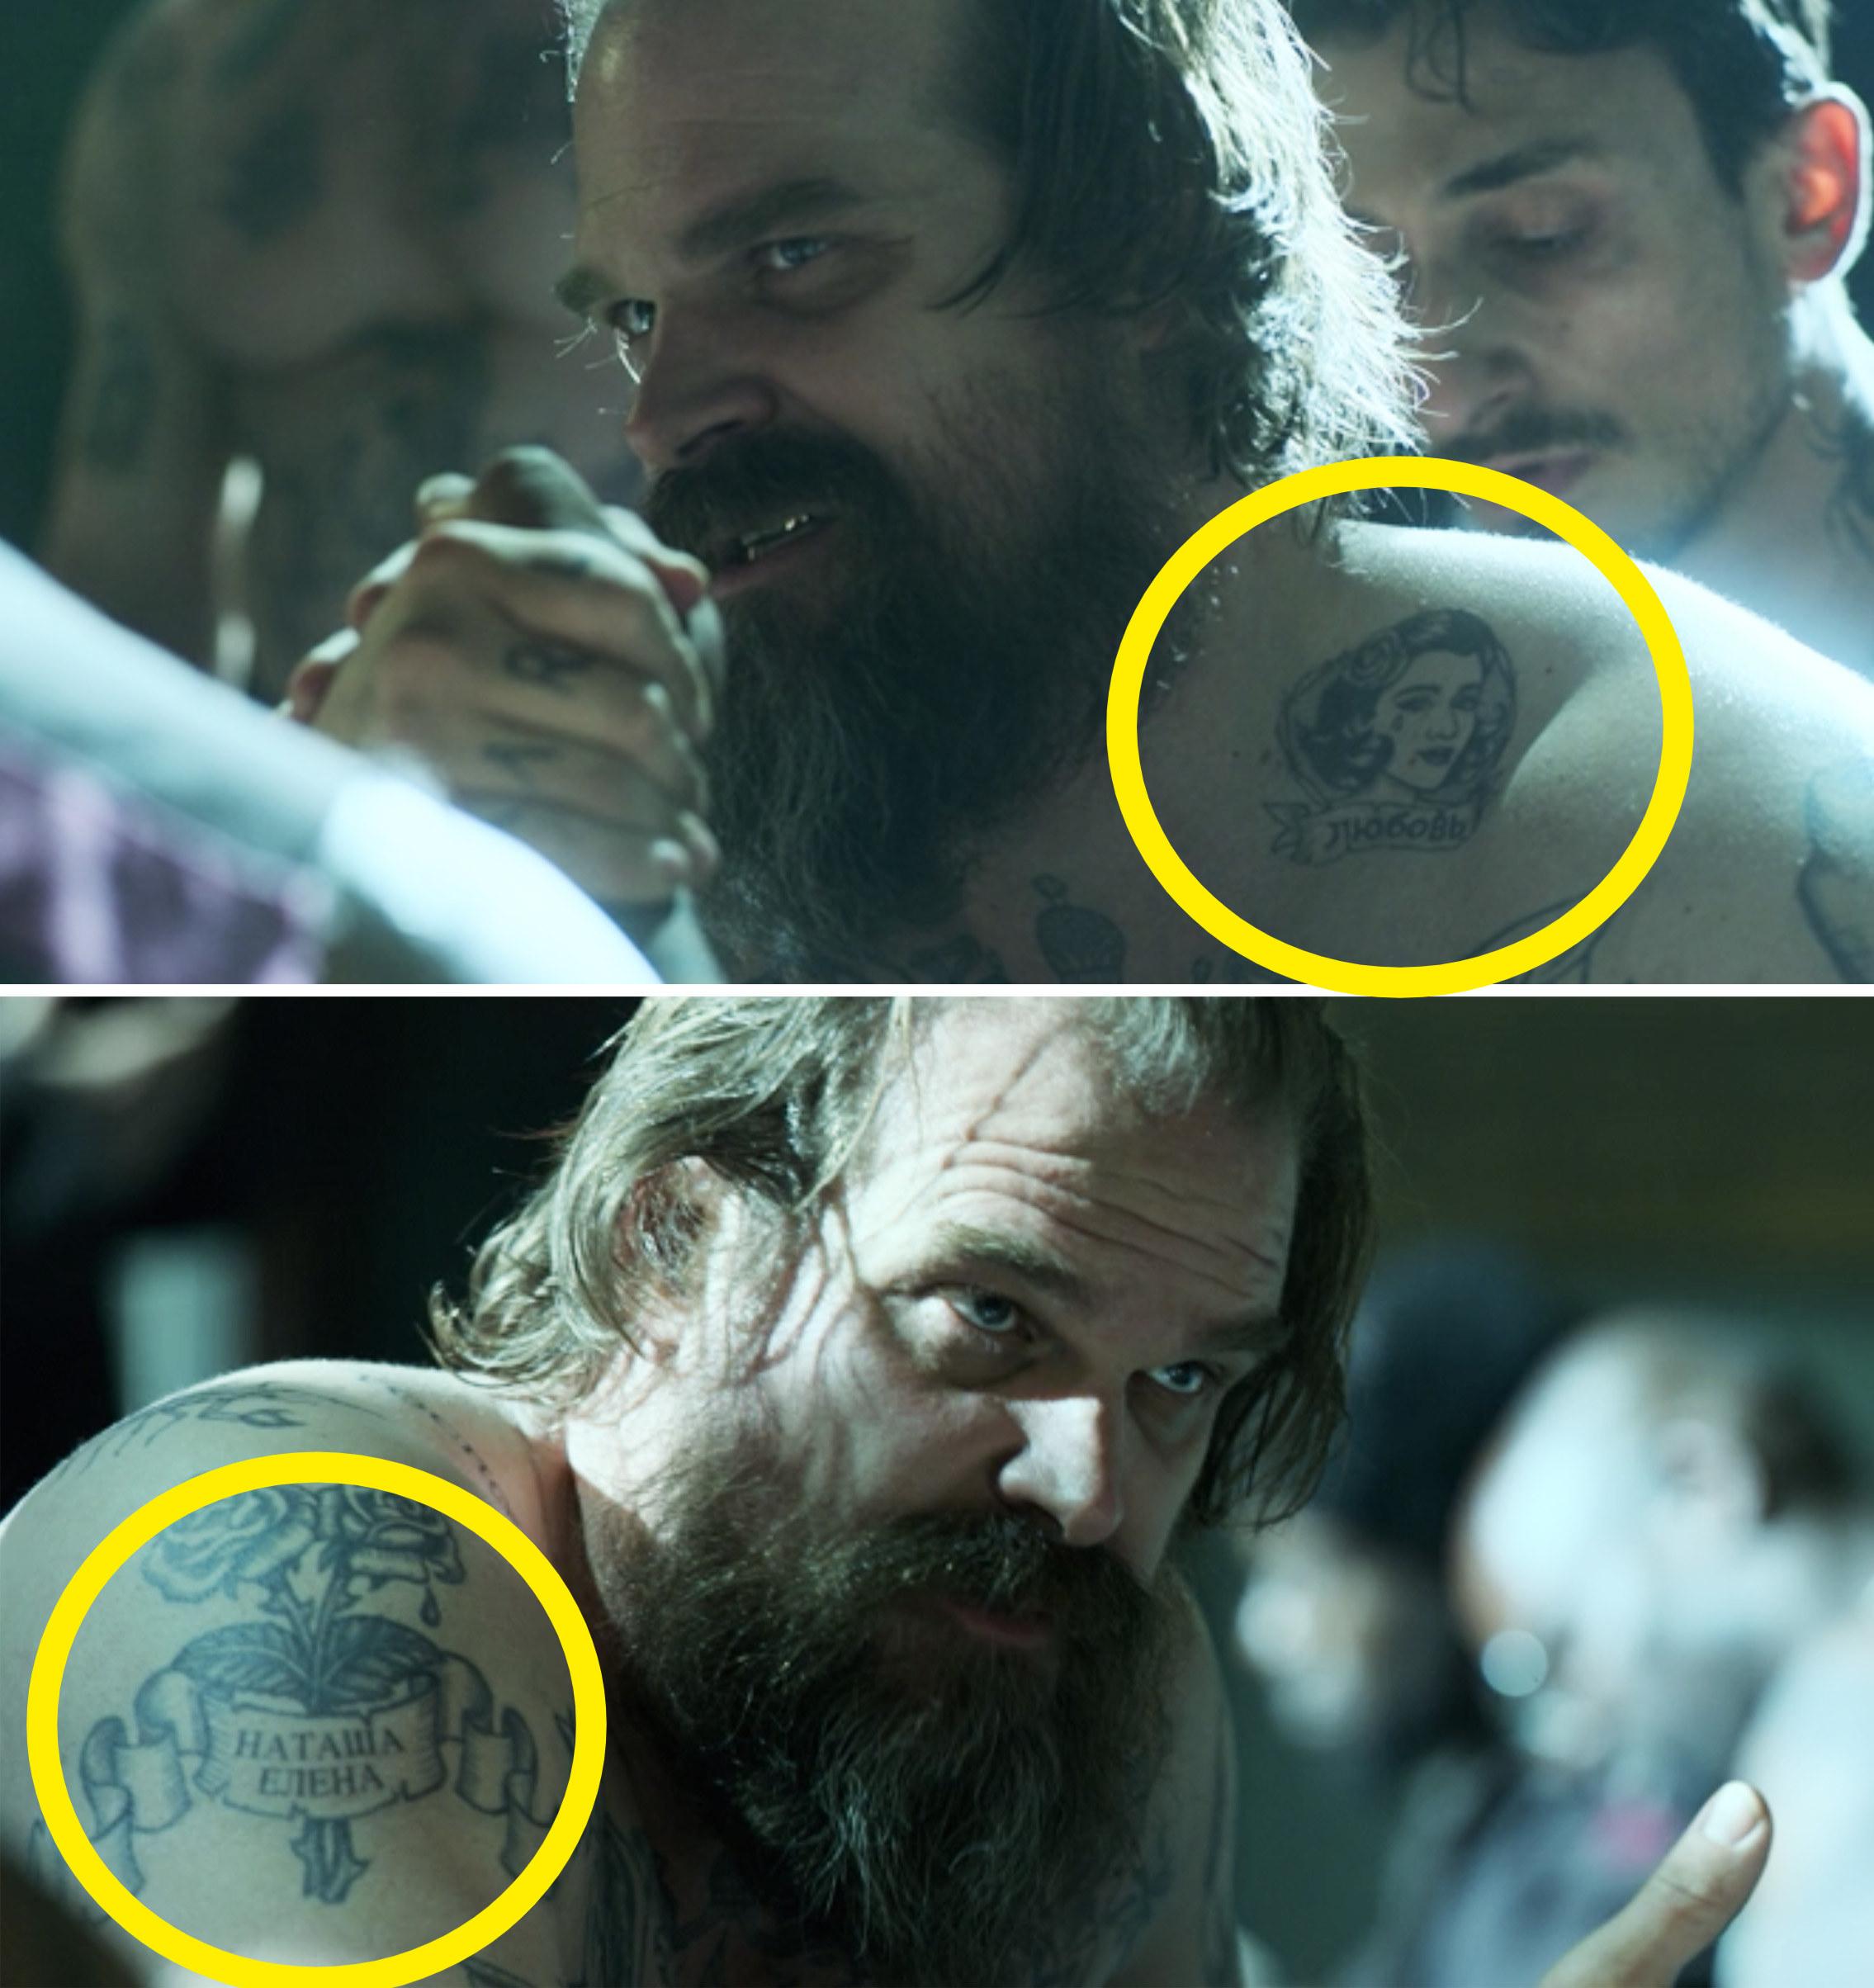 A close-up of Alexei's tattoo of Melina's face and Natasha and Yelena's names